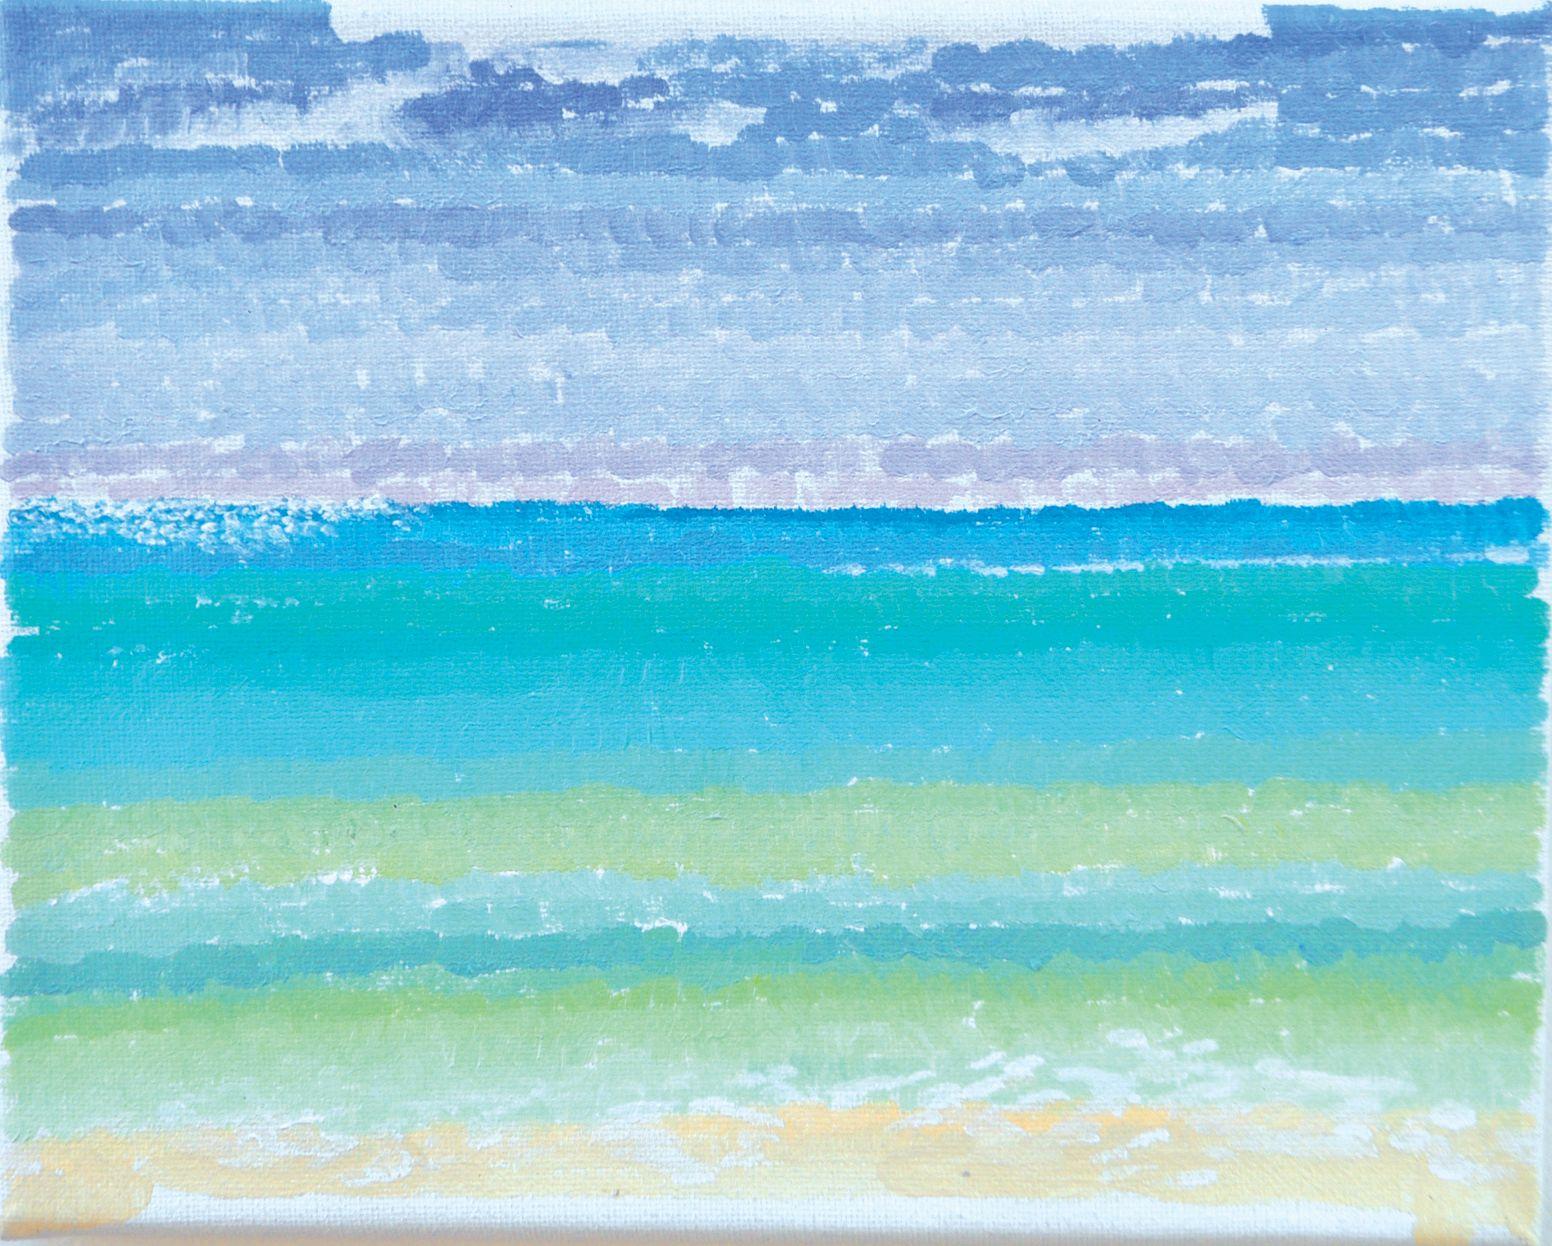 "'Nokomis Beach, Casey Key"", 2012  acrylic on linen. 8 x 10. Part of the Florida gulf Coast series."